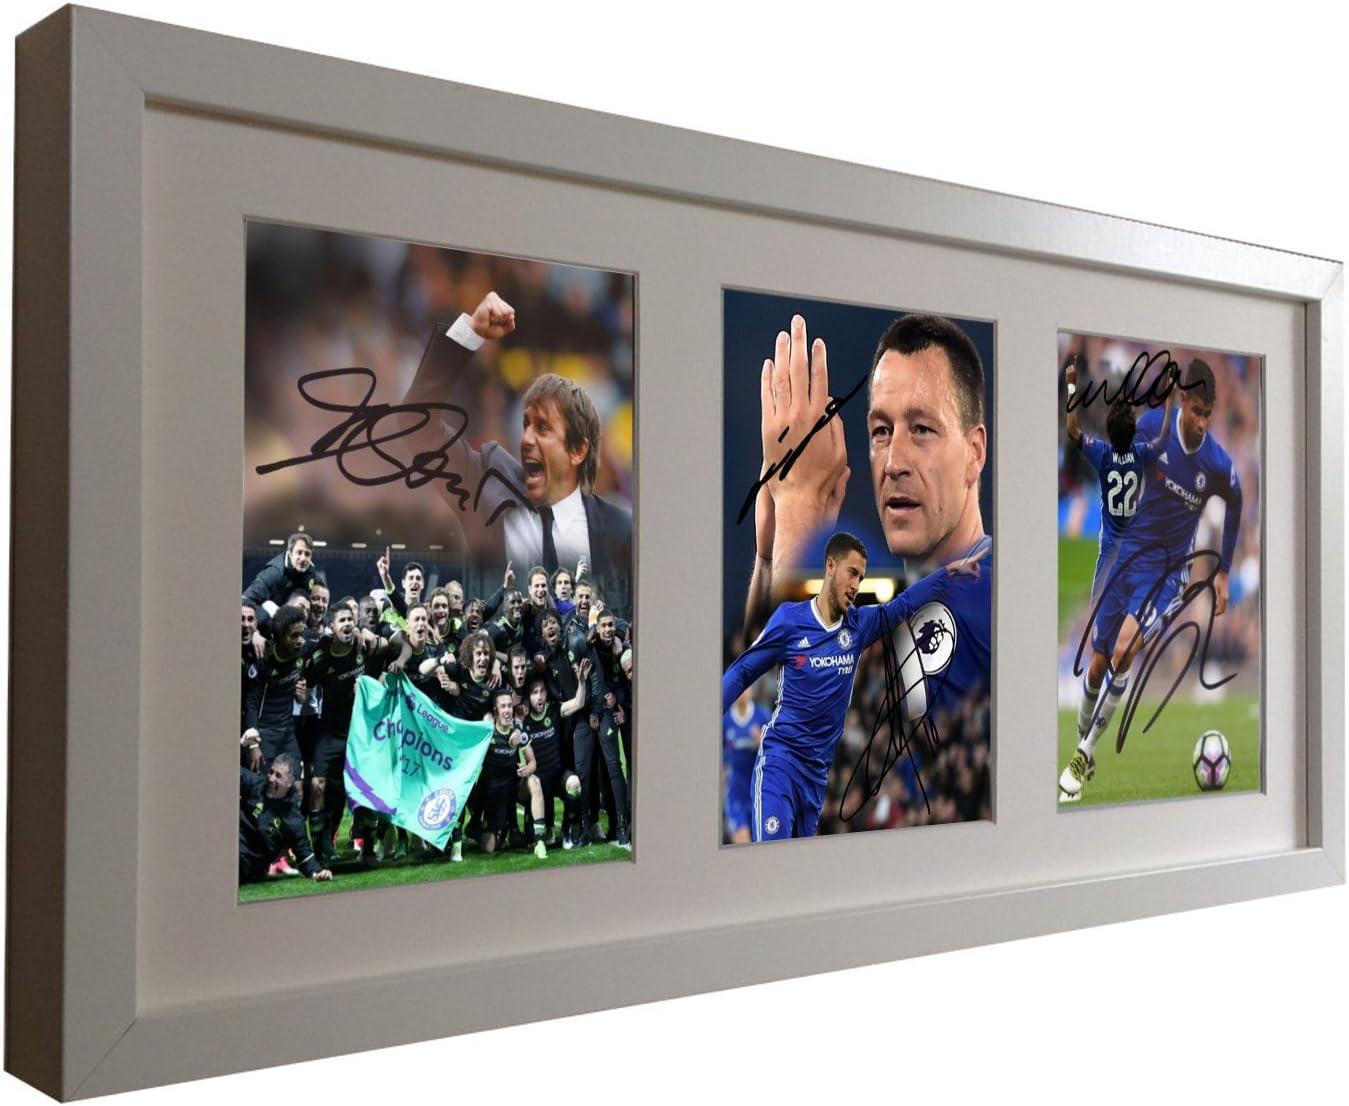 Signed Soccer White Celebration Edition 2017 Premier League Win Conte-John Terry-Eden Hazard-Willian-Deigo Costa Chelsea Autographed Photo Photographed Picture Frame Football Gift